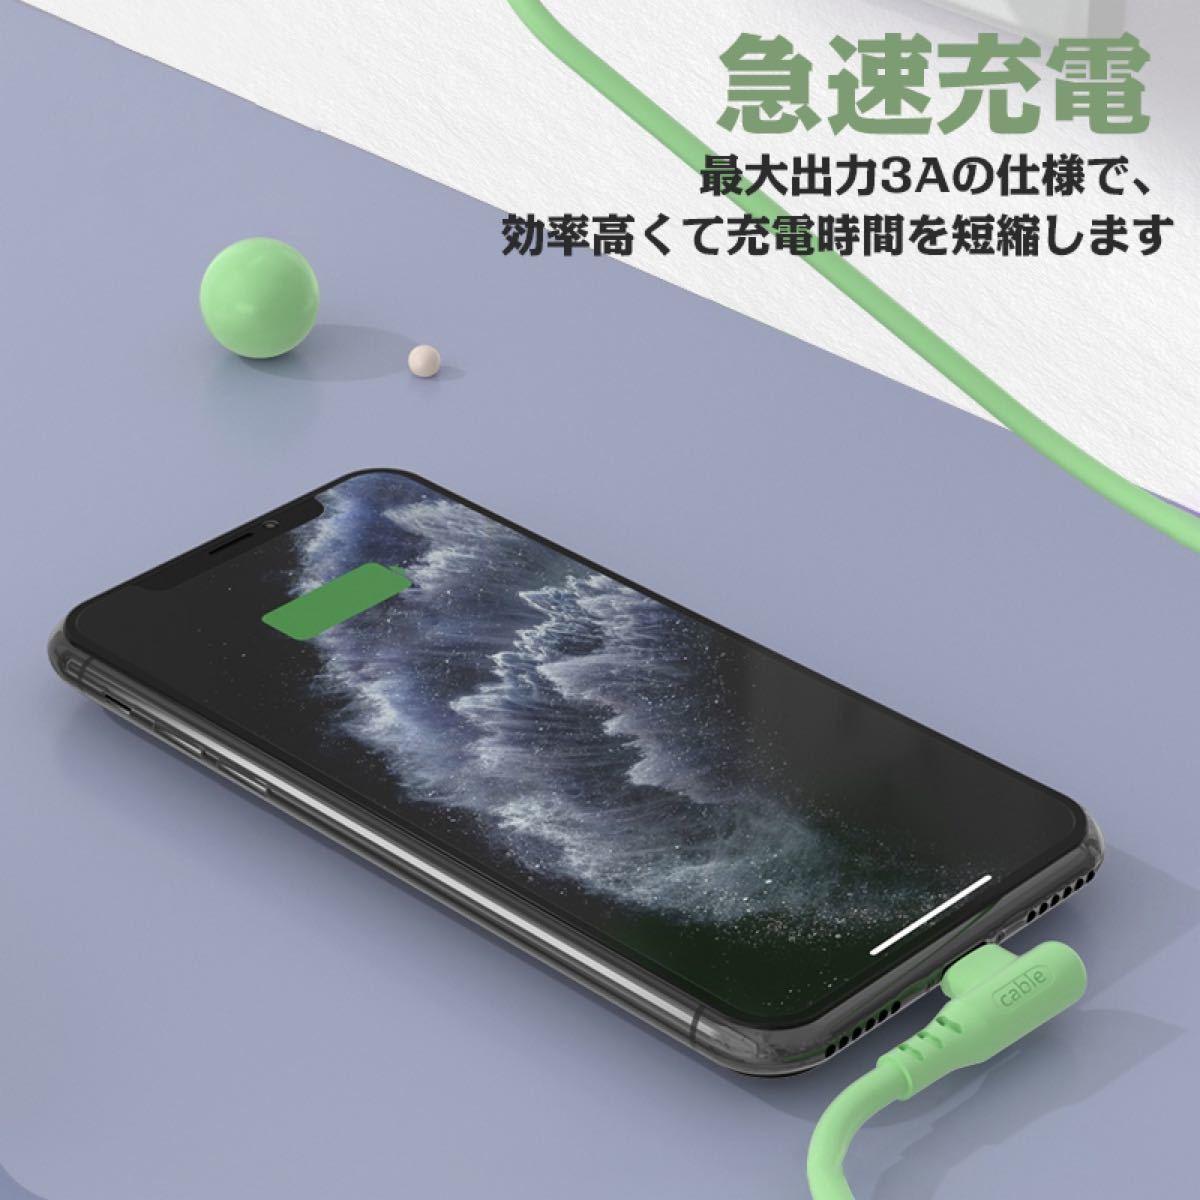 iPhone ケーブル 充電ケーブル 充電器 USB コード 急速充電